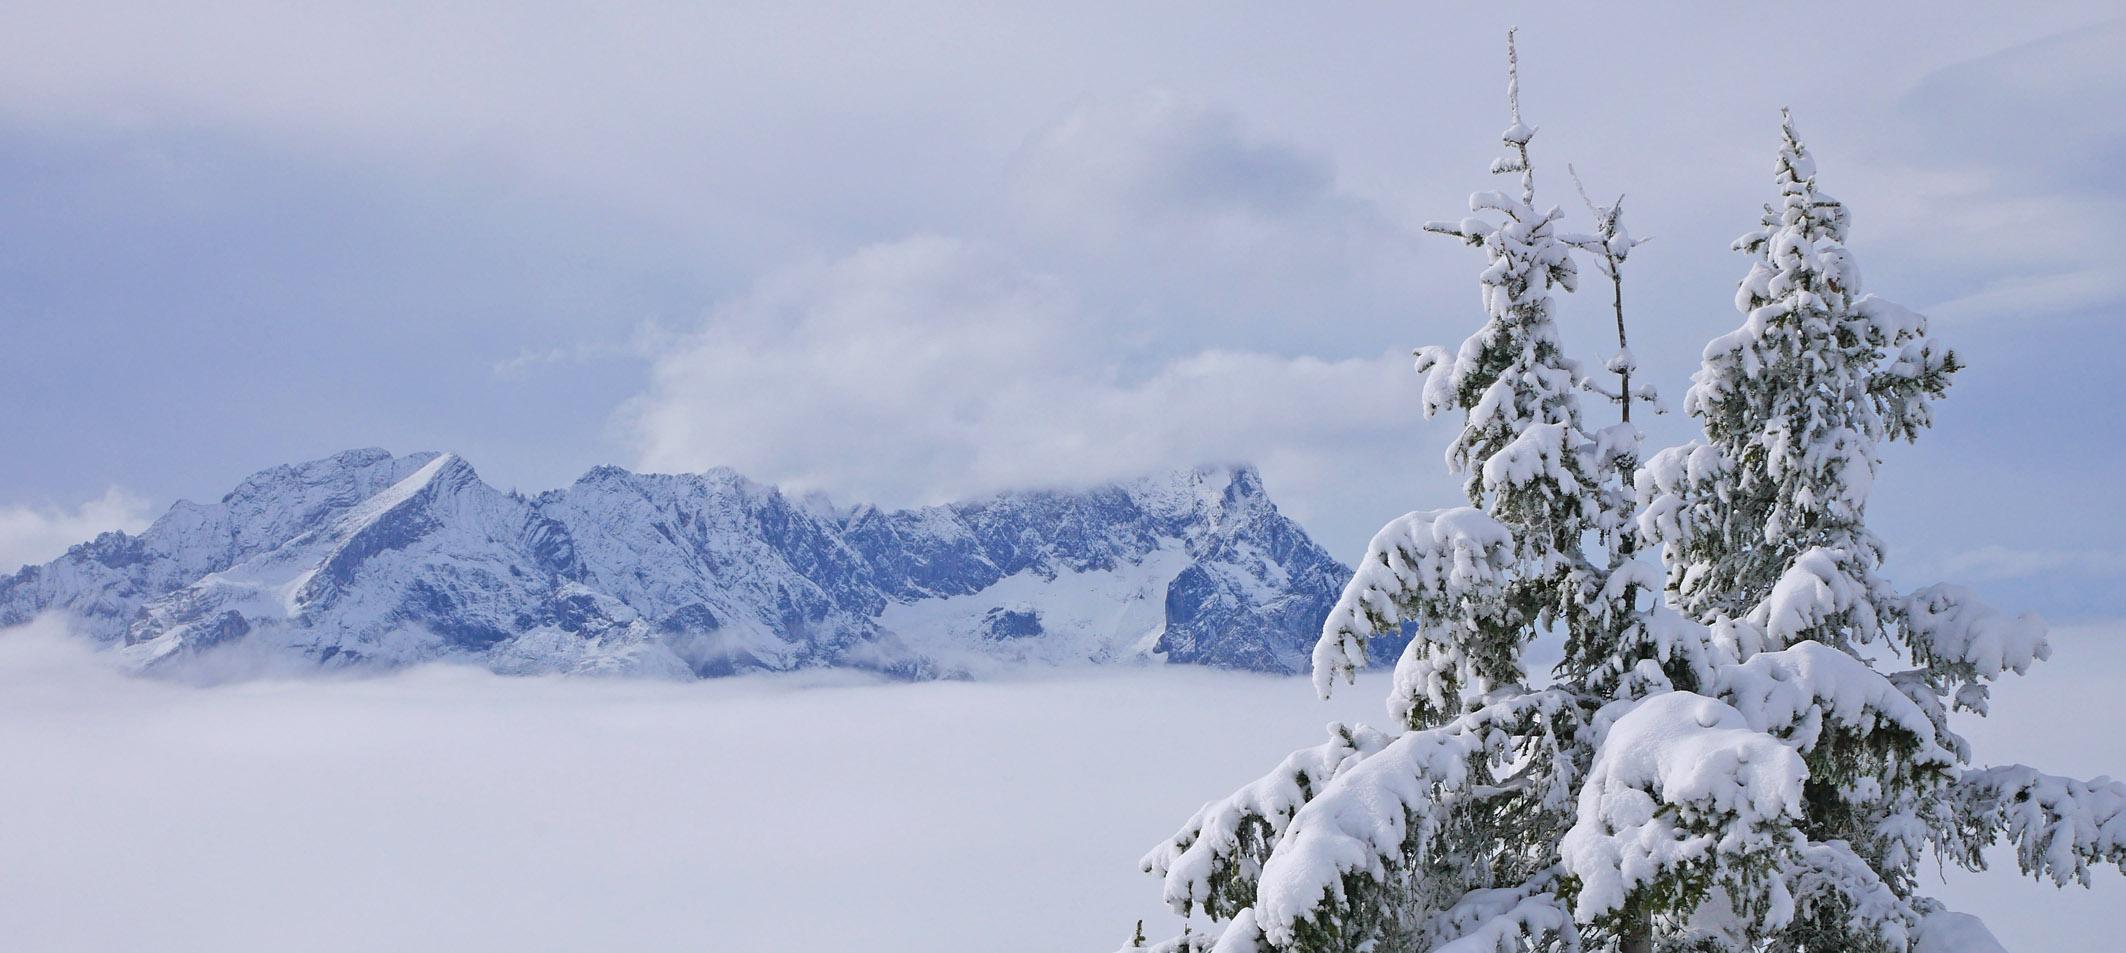 Wank erster Schnee Panorama Wettersteingebirge